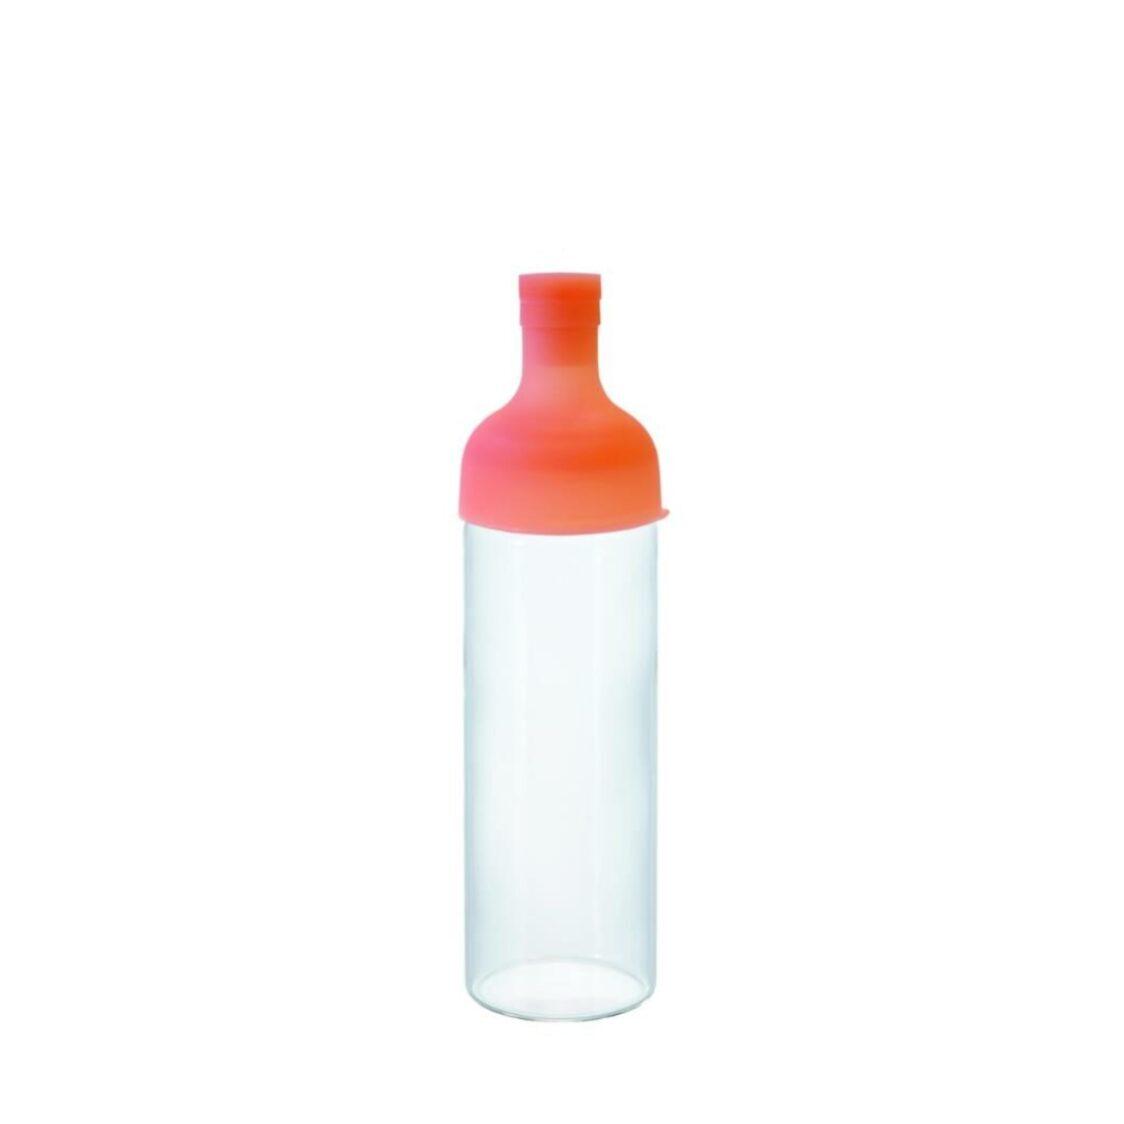 Hario 750ml Tropical Cold Brew Tea Filter In Bottle - Hawaiian Orange FIB-75TP-HOR